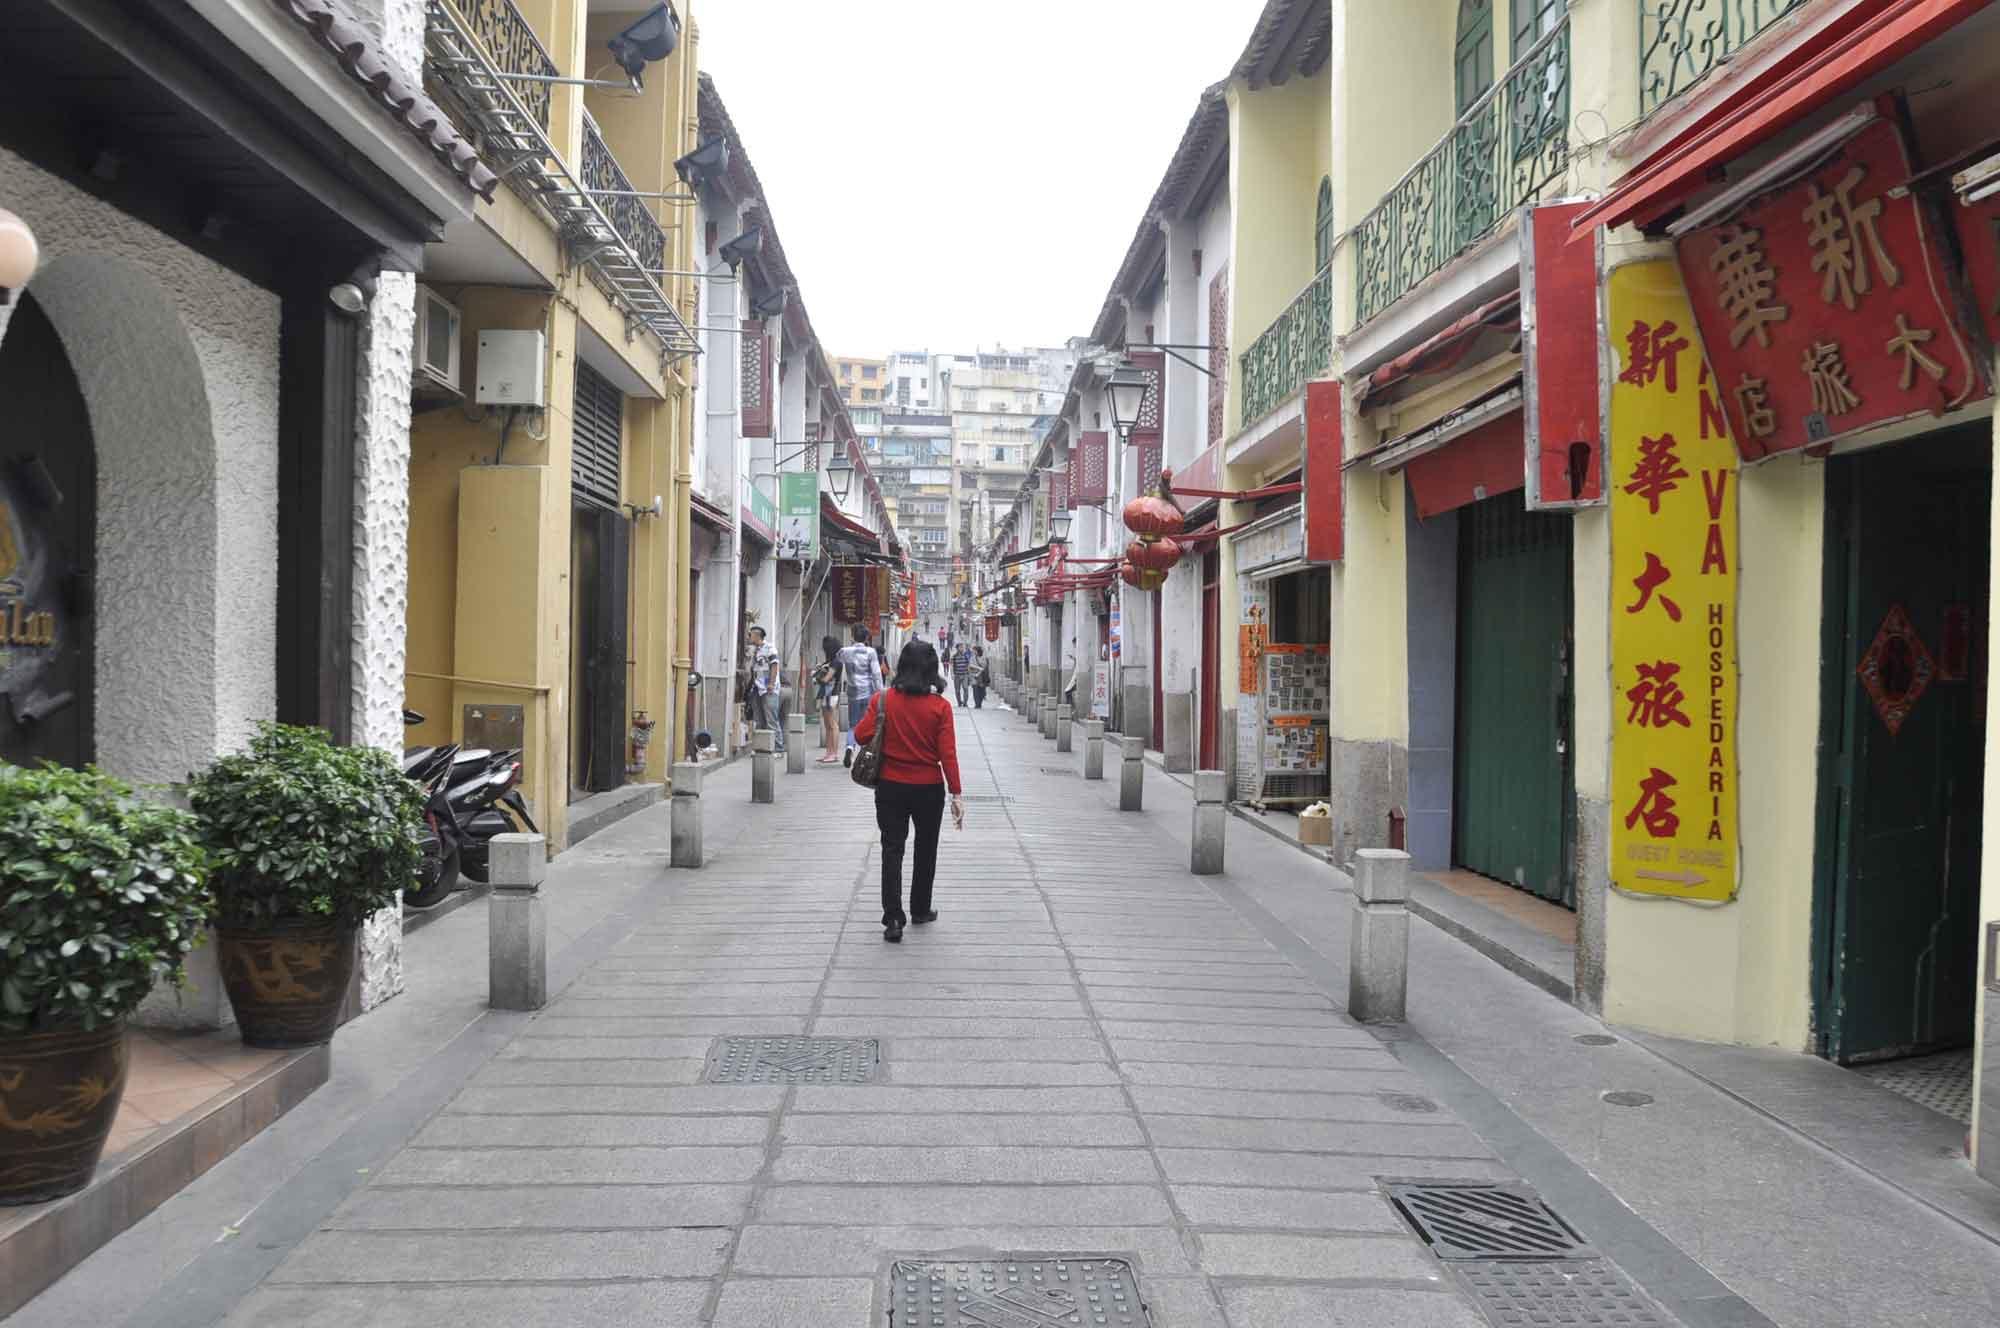 Street of Happiess Rua de Felicidade